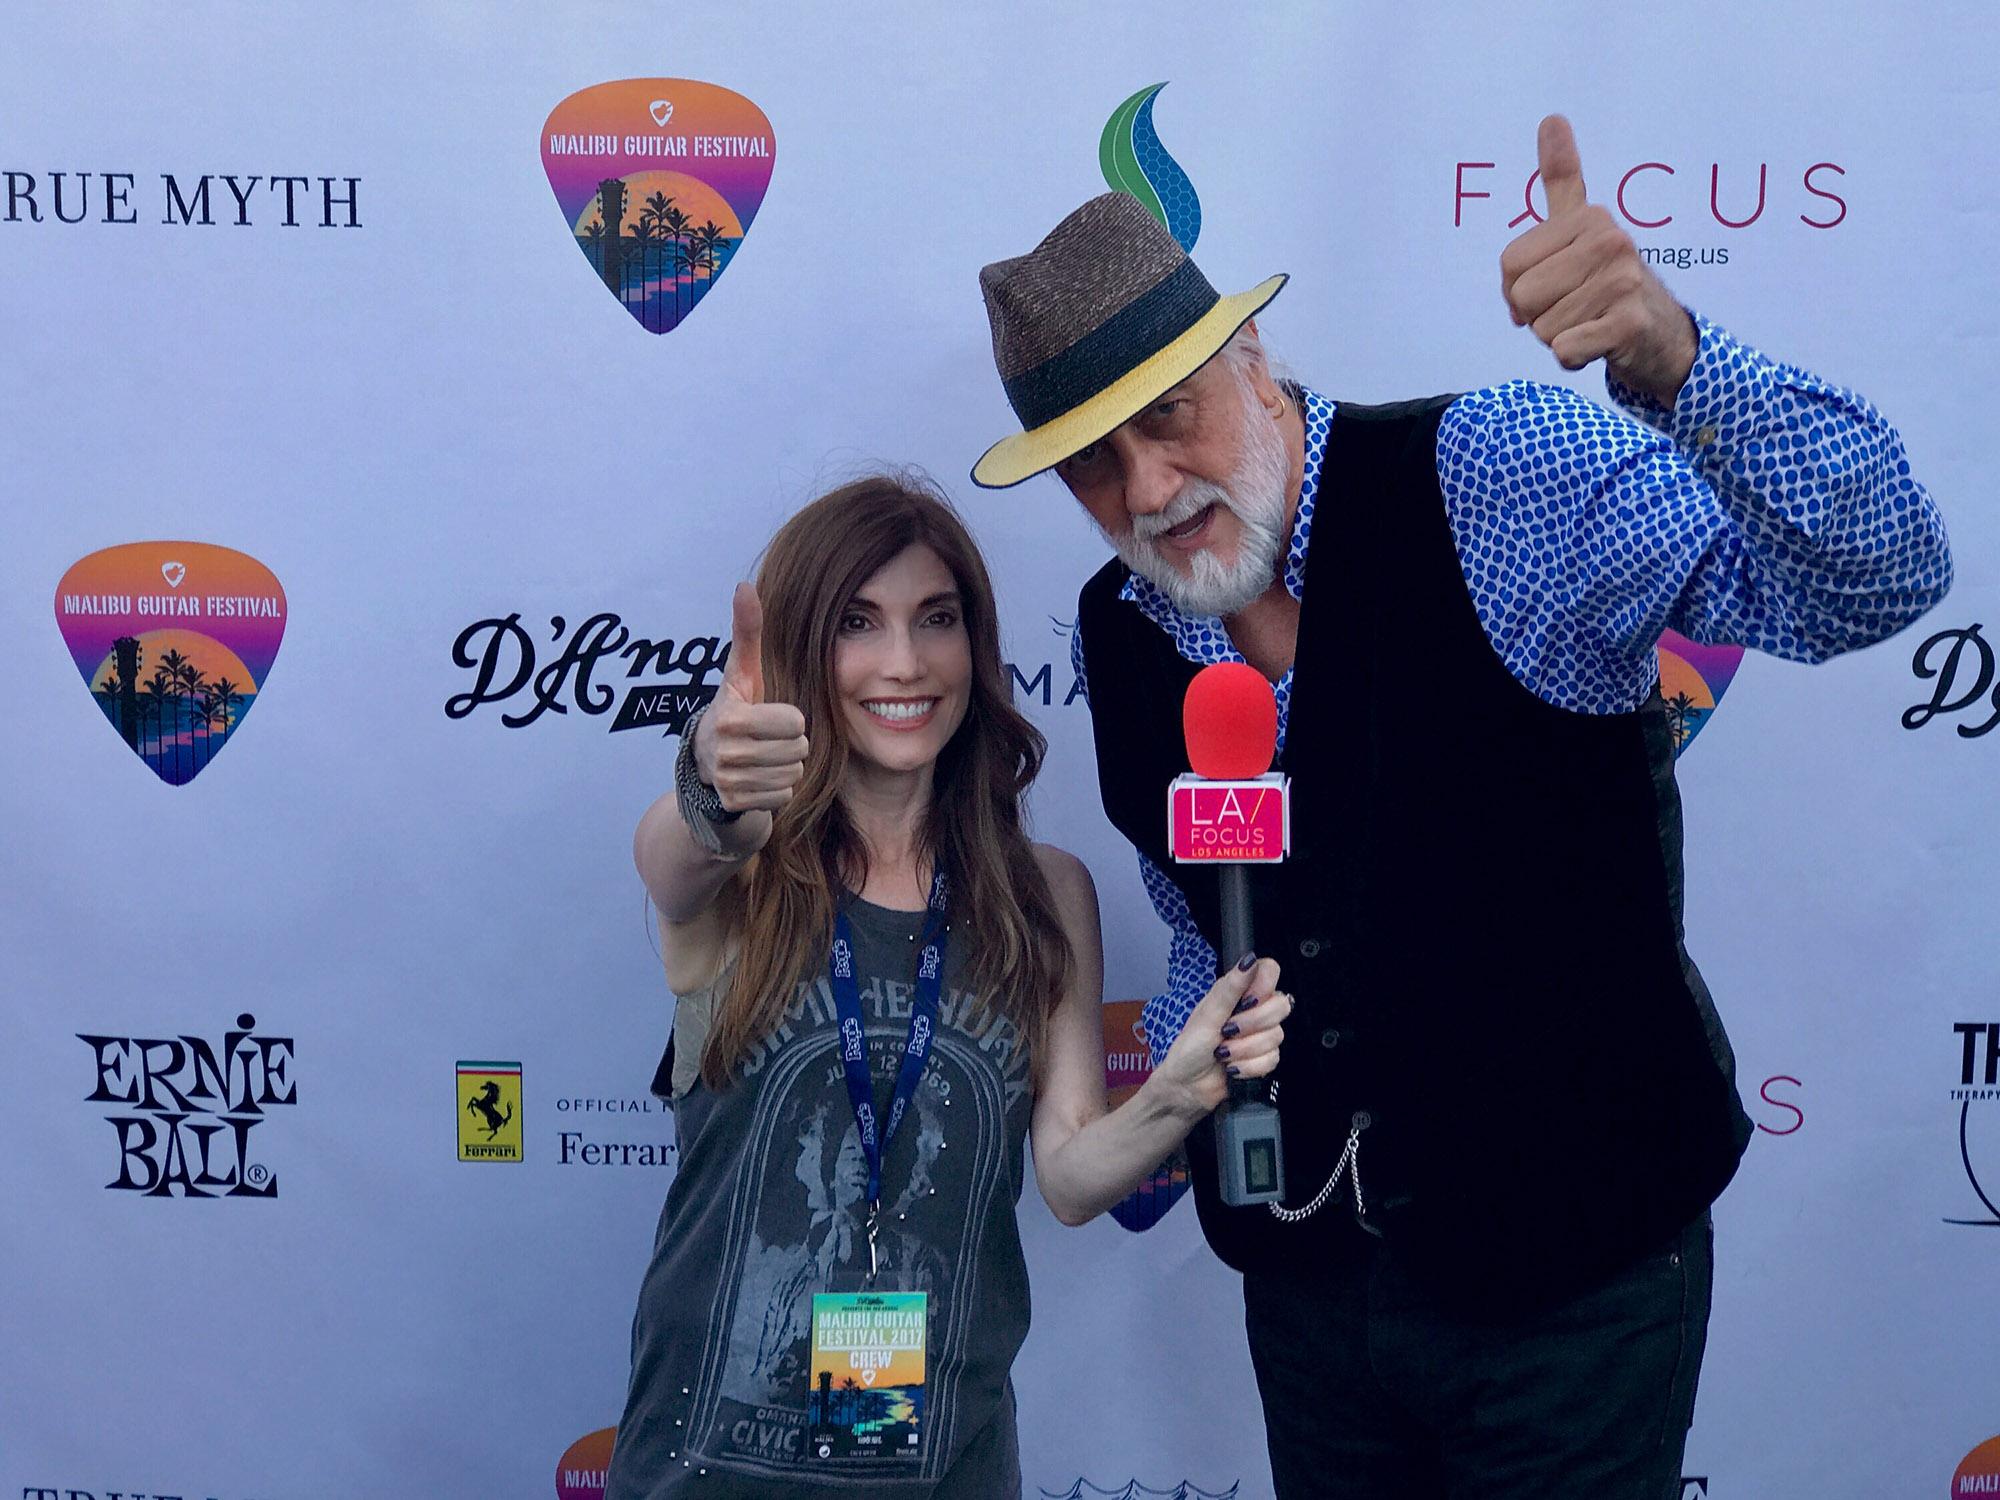 Tambi with Mick Fleetwood